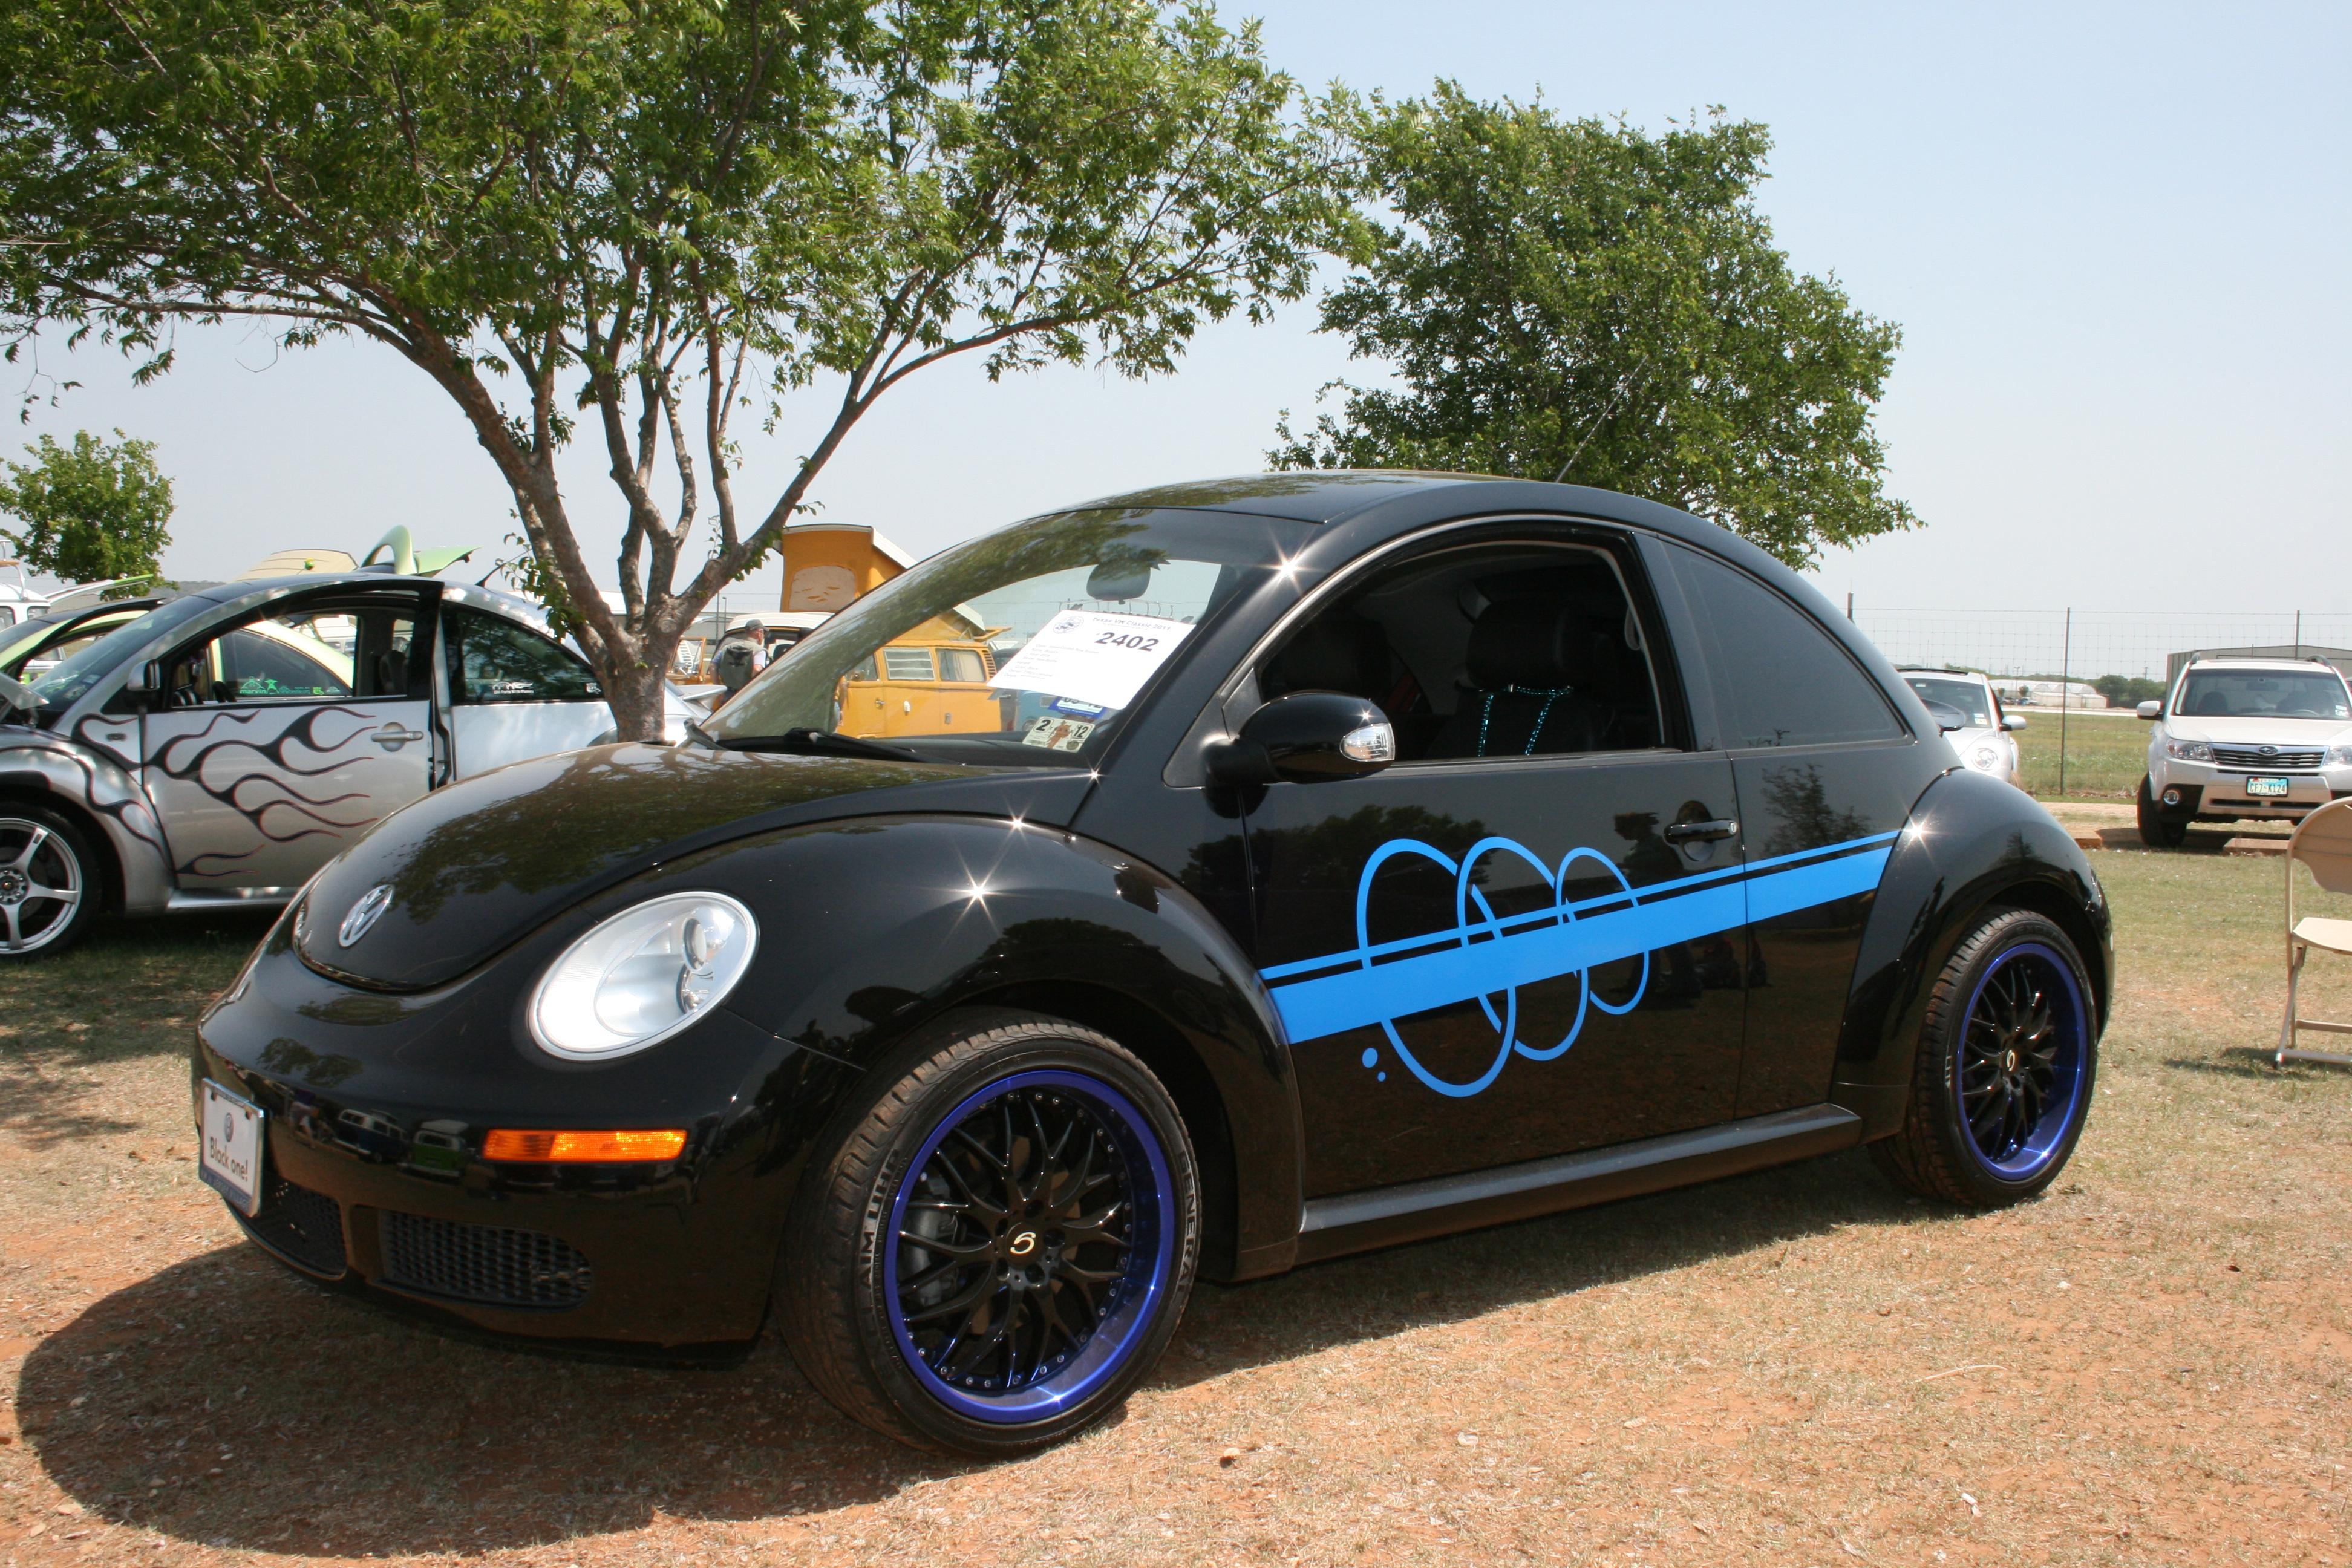 Buggzy 2402 Texas Vw Classic